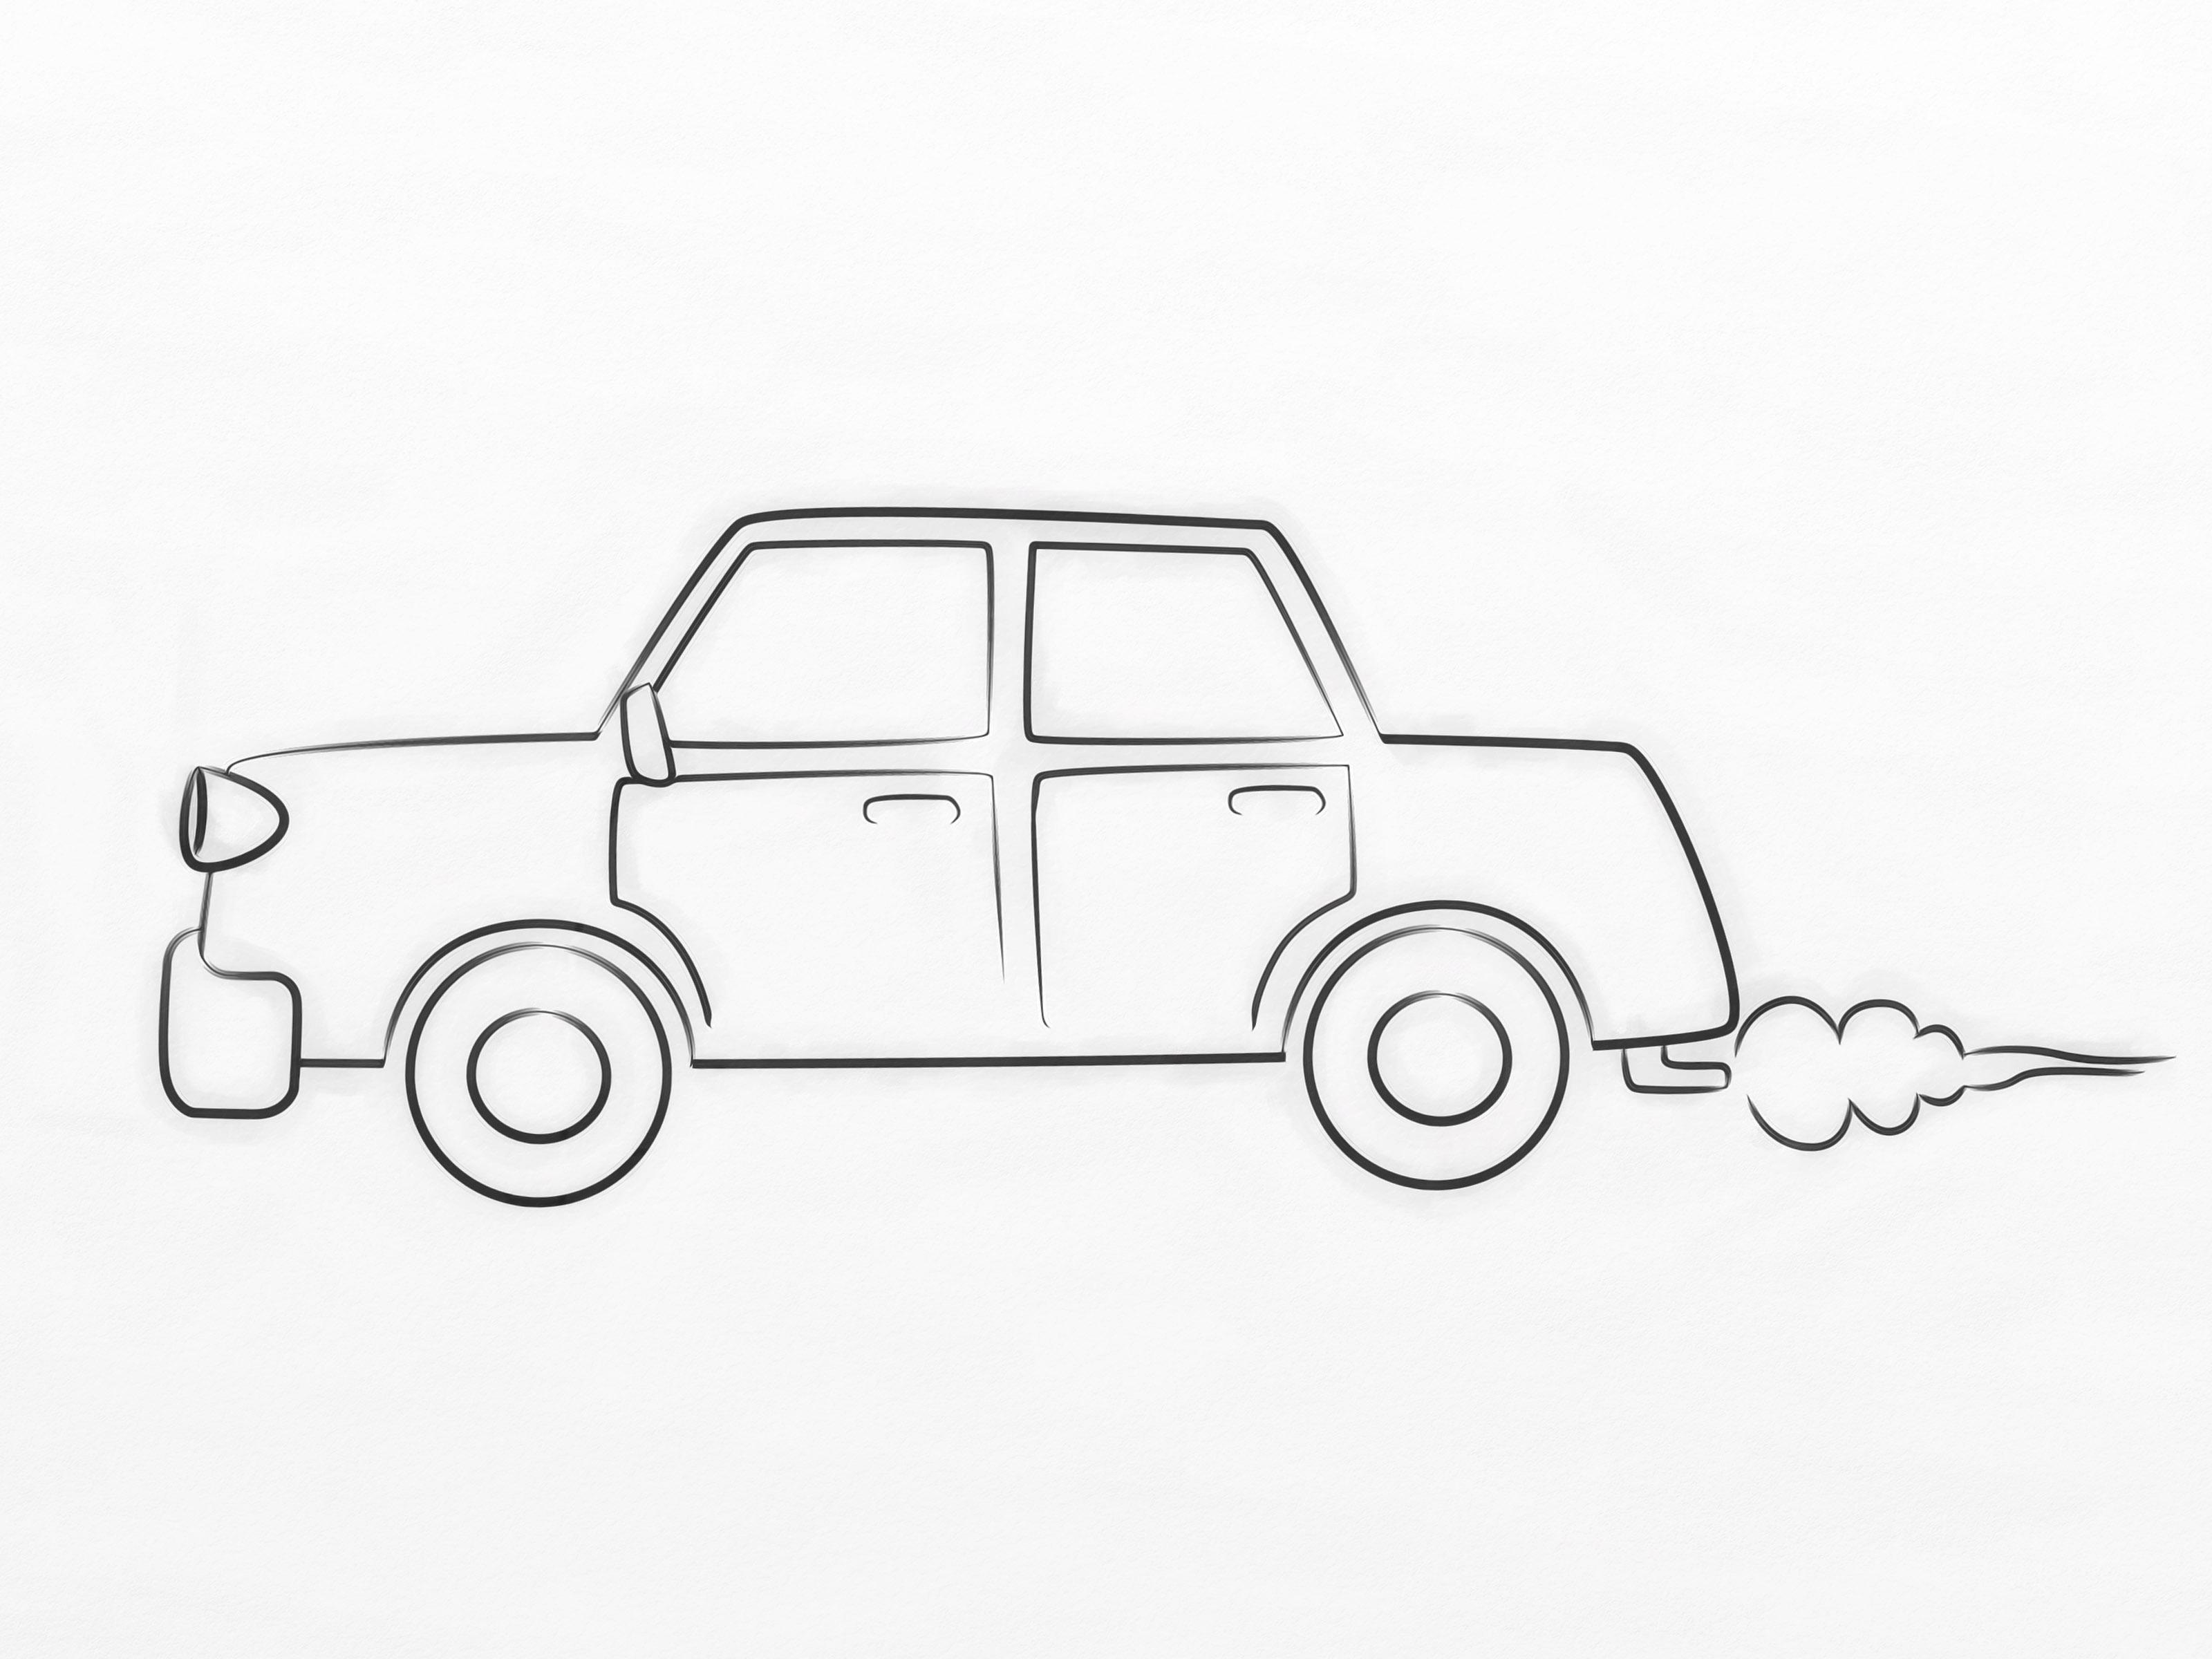 3200x2400 car drawing on